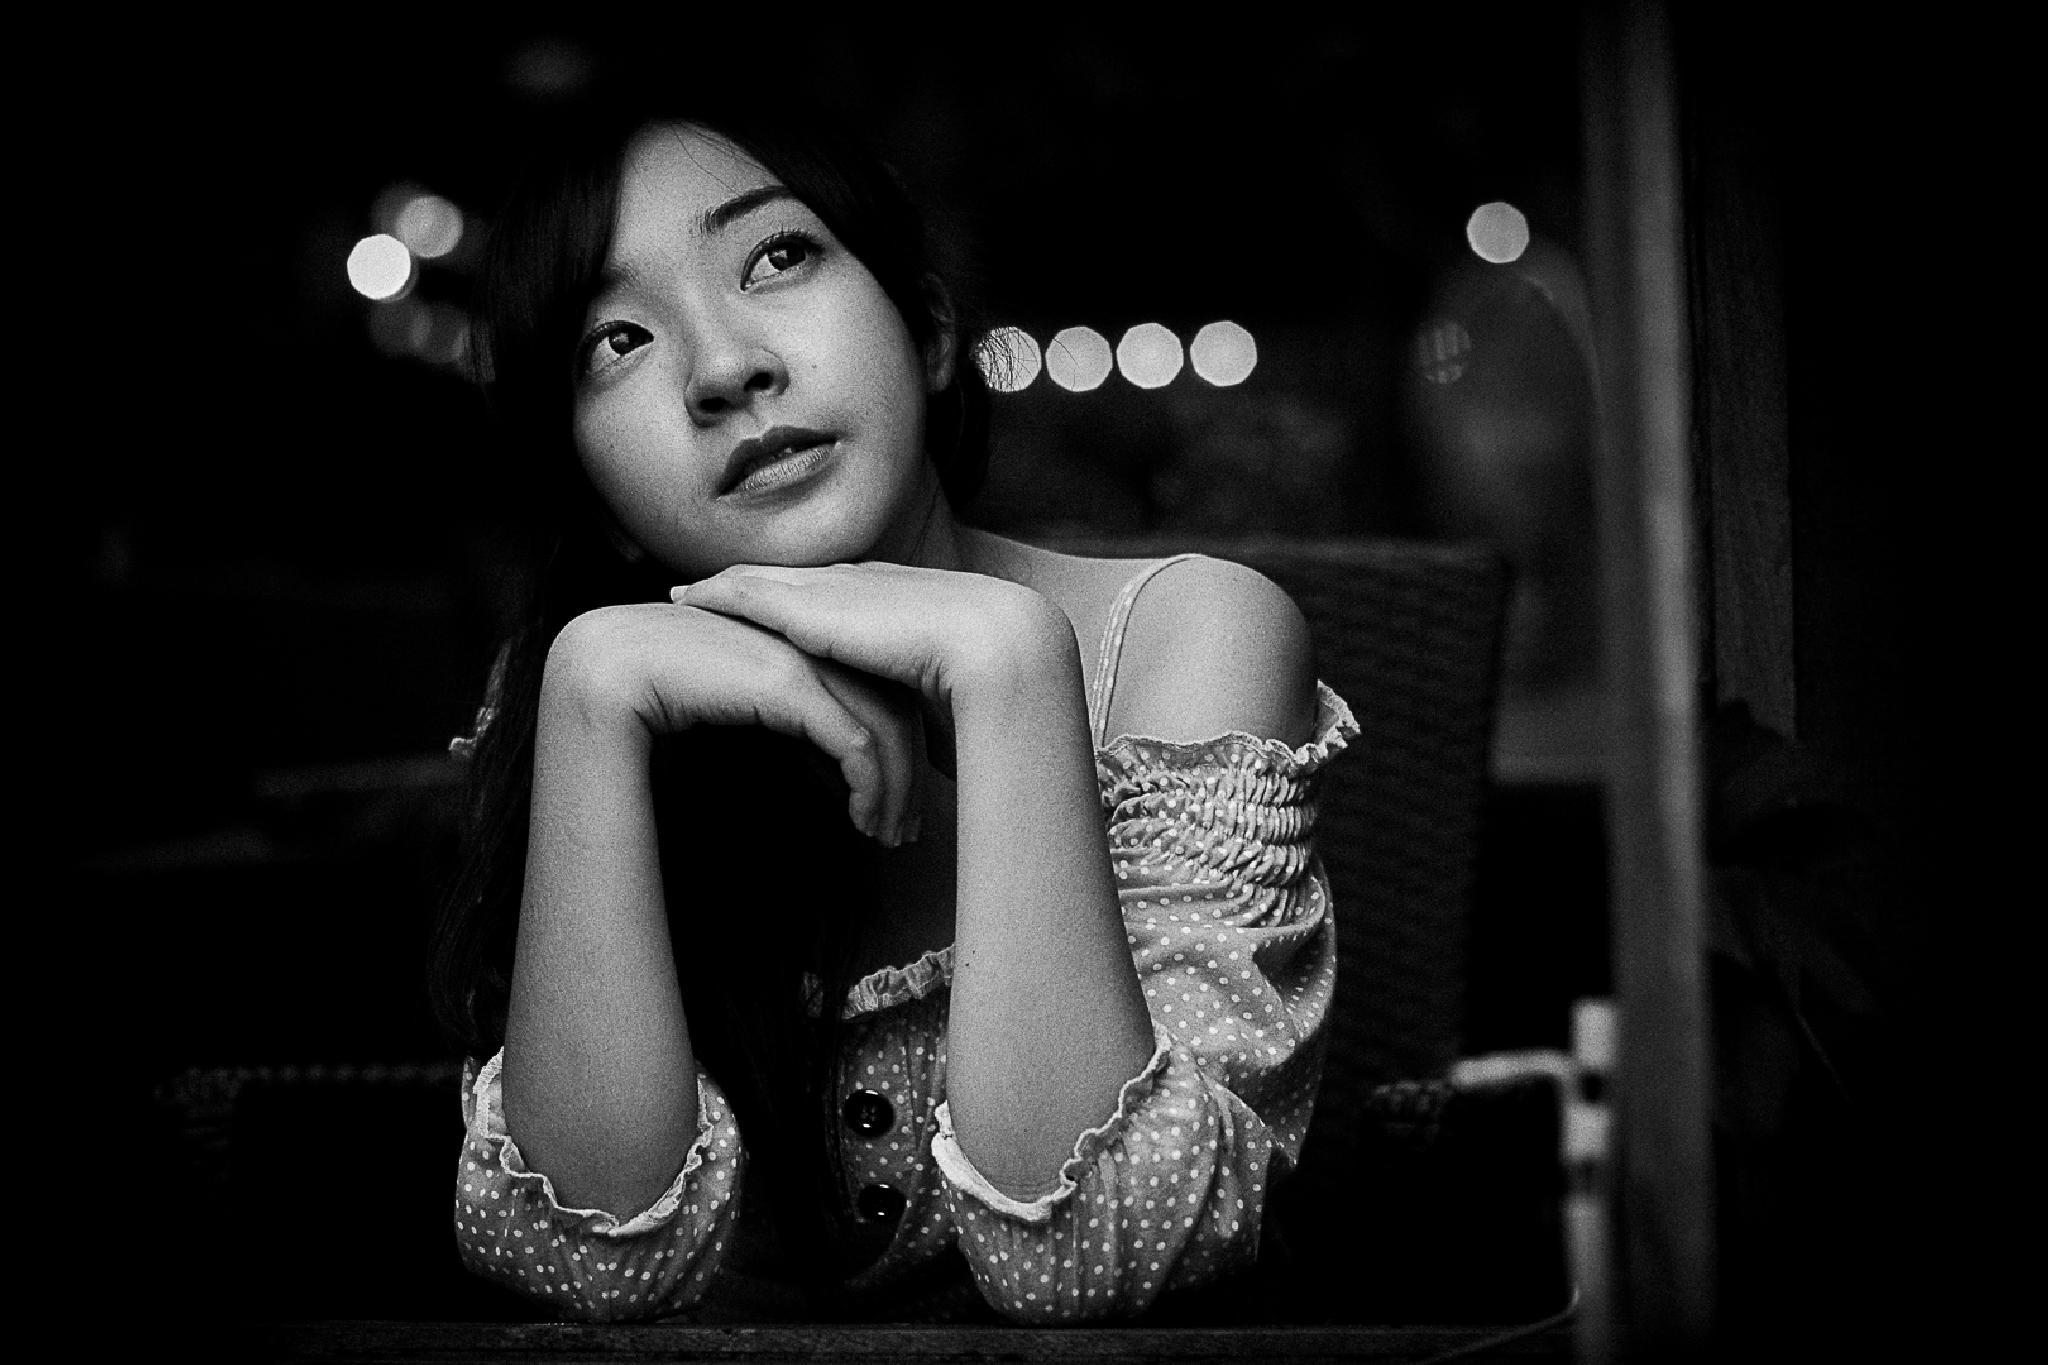 Noie by Thongchai Suriyarutsameevet